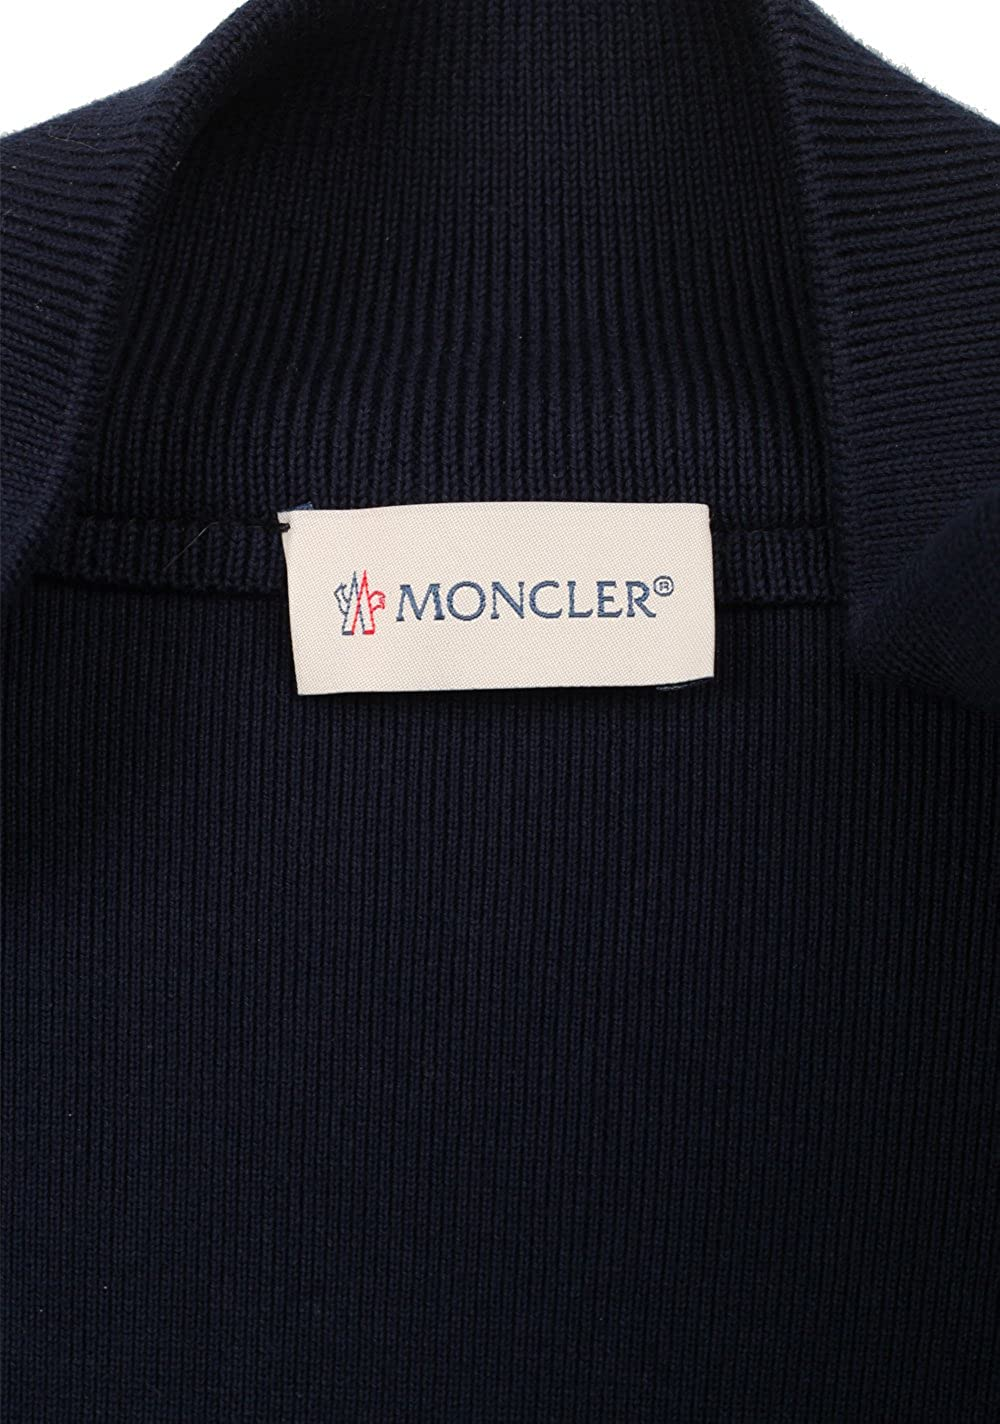 MONCLER CL Navy Maglia Suede Cardigan Coat Size L / 50/40 U.S. ...